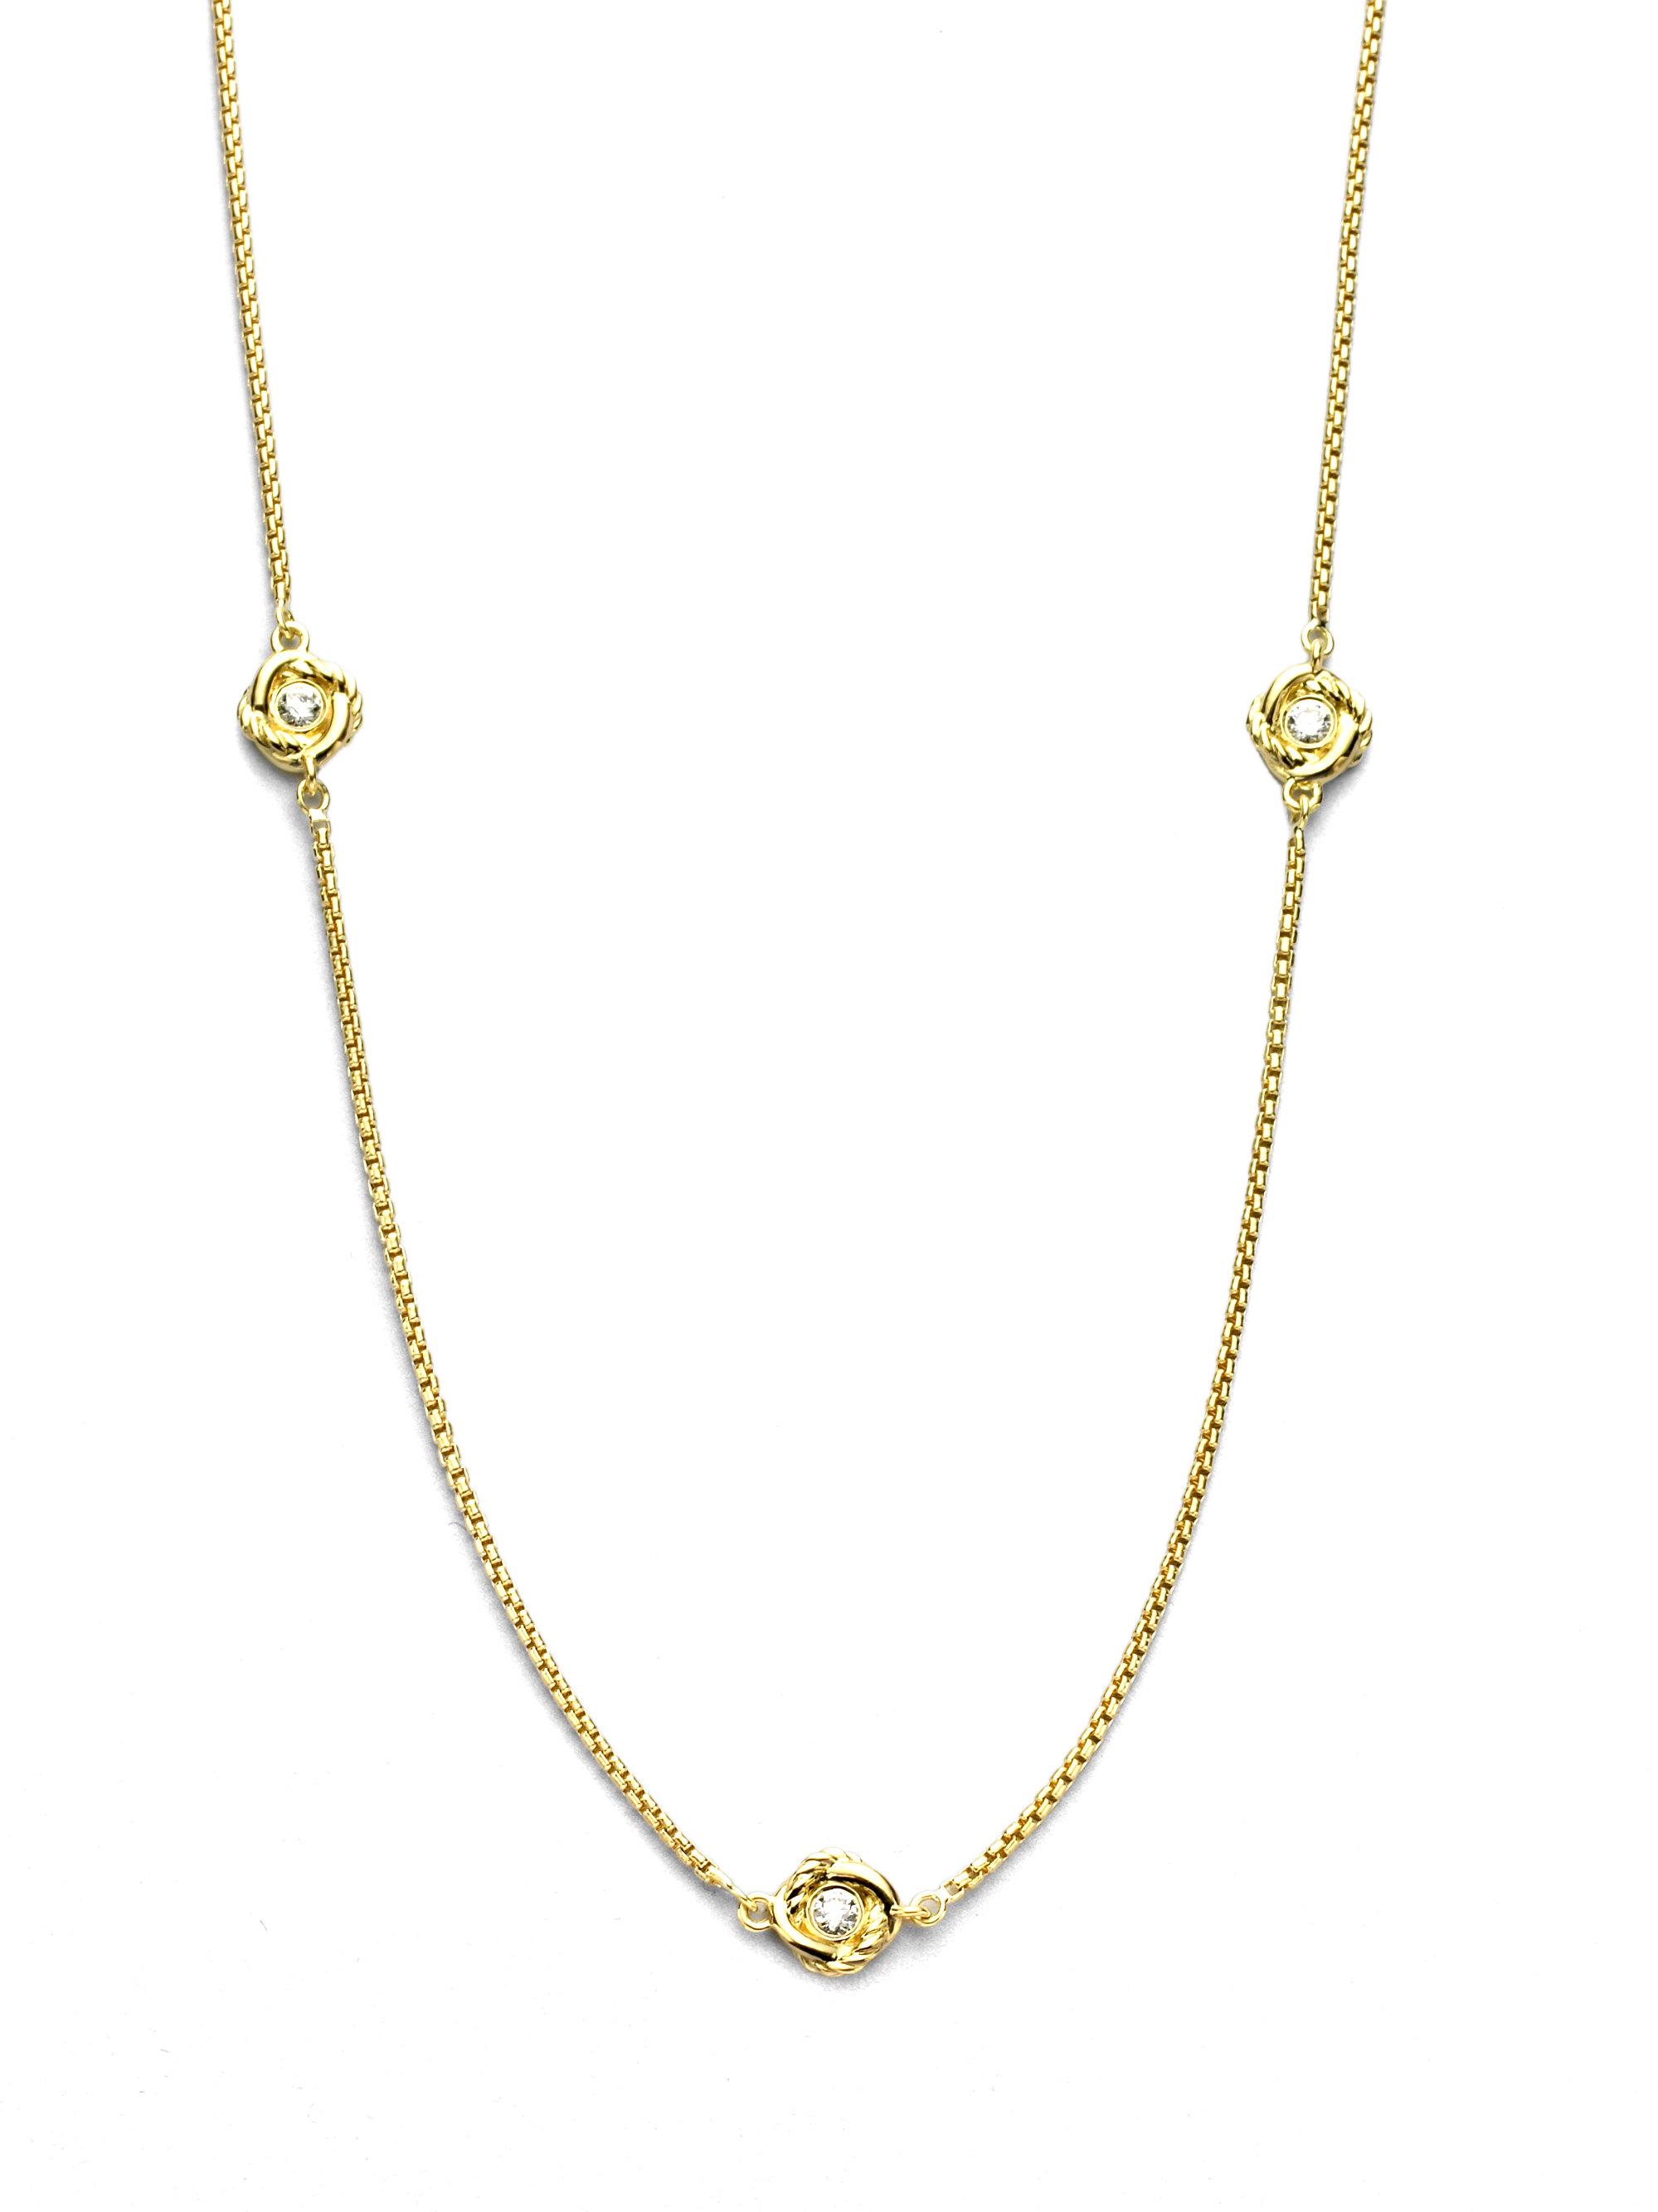 David Yurman Diamond 18k Yellow Gold Chain Necklace In